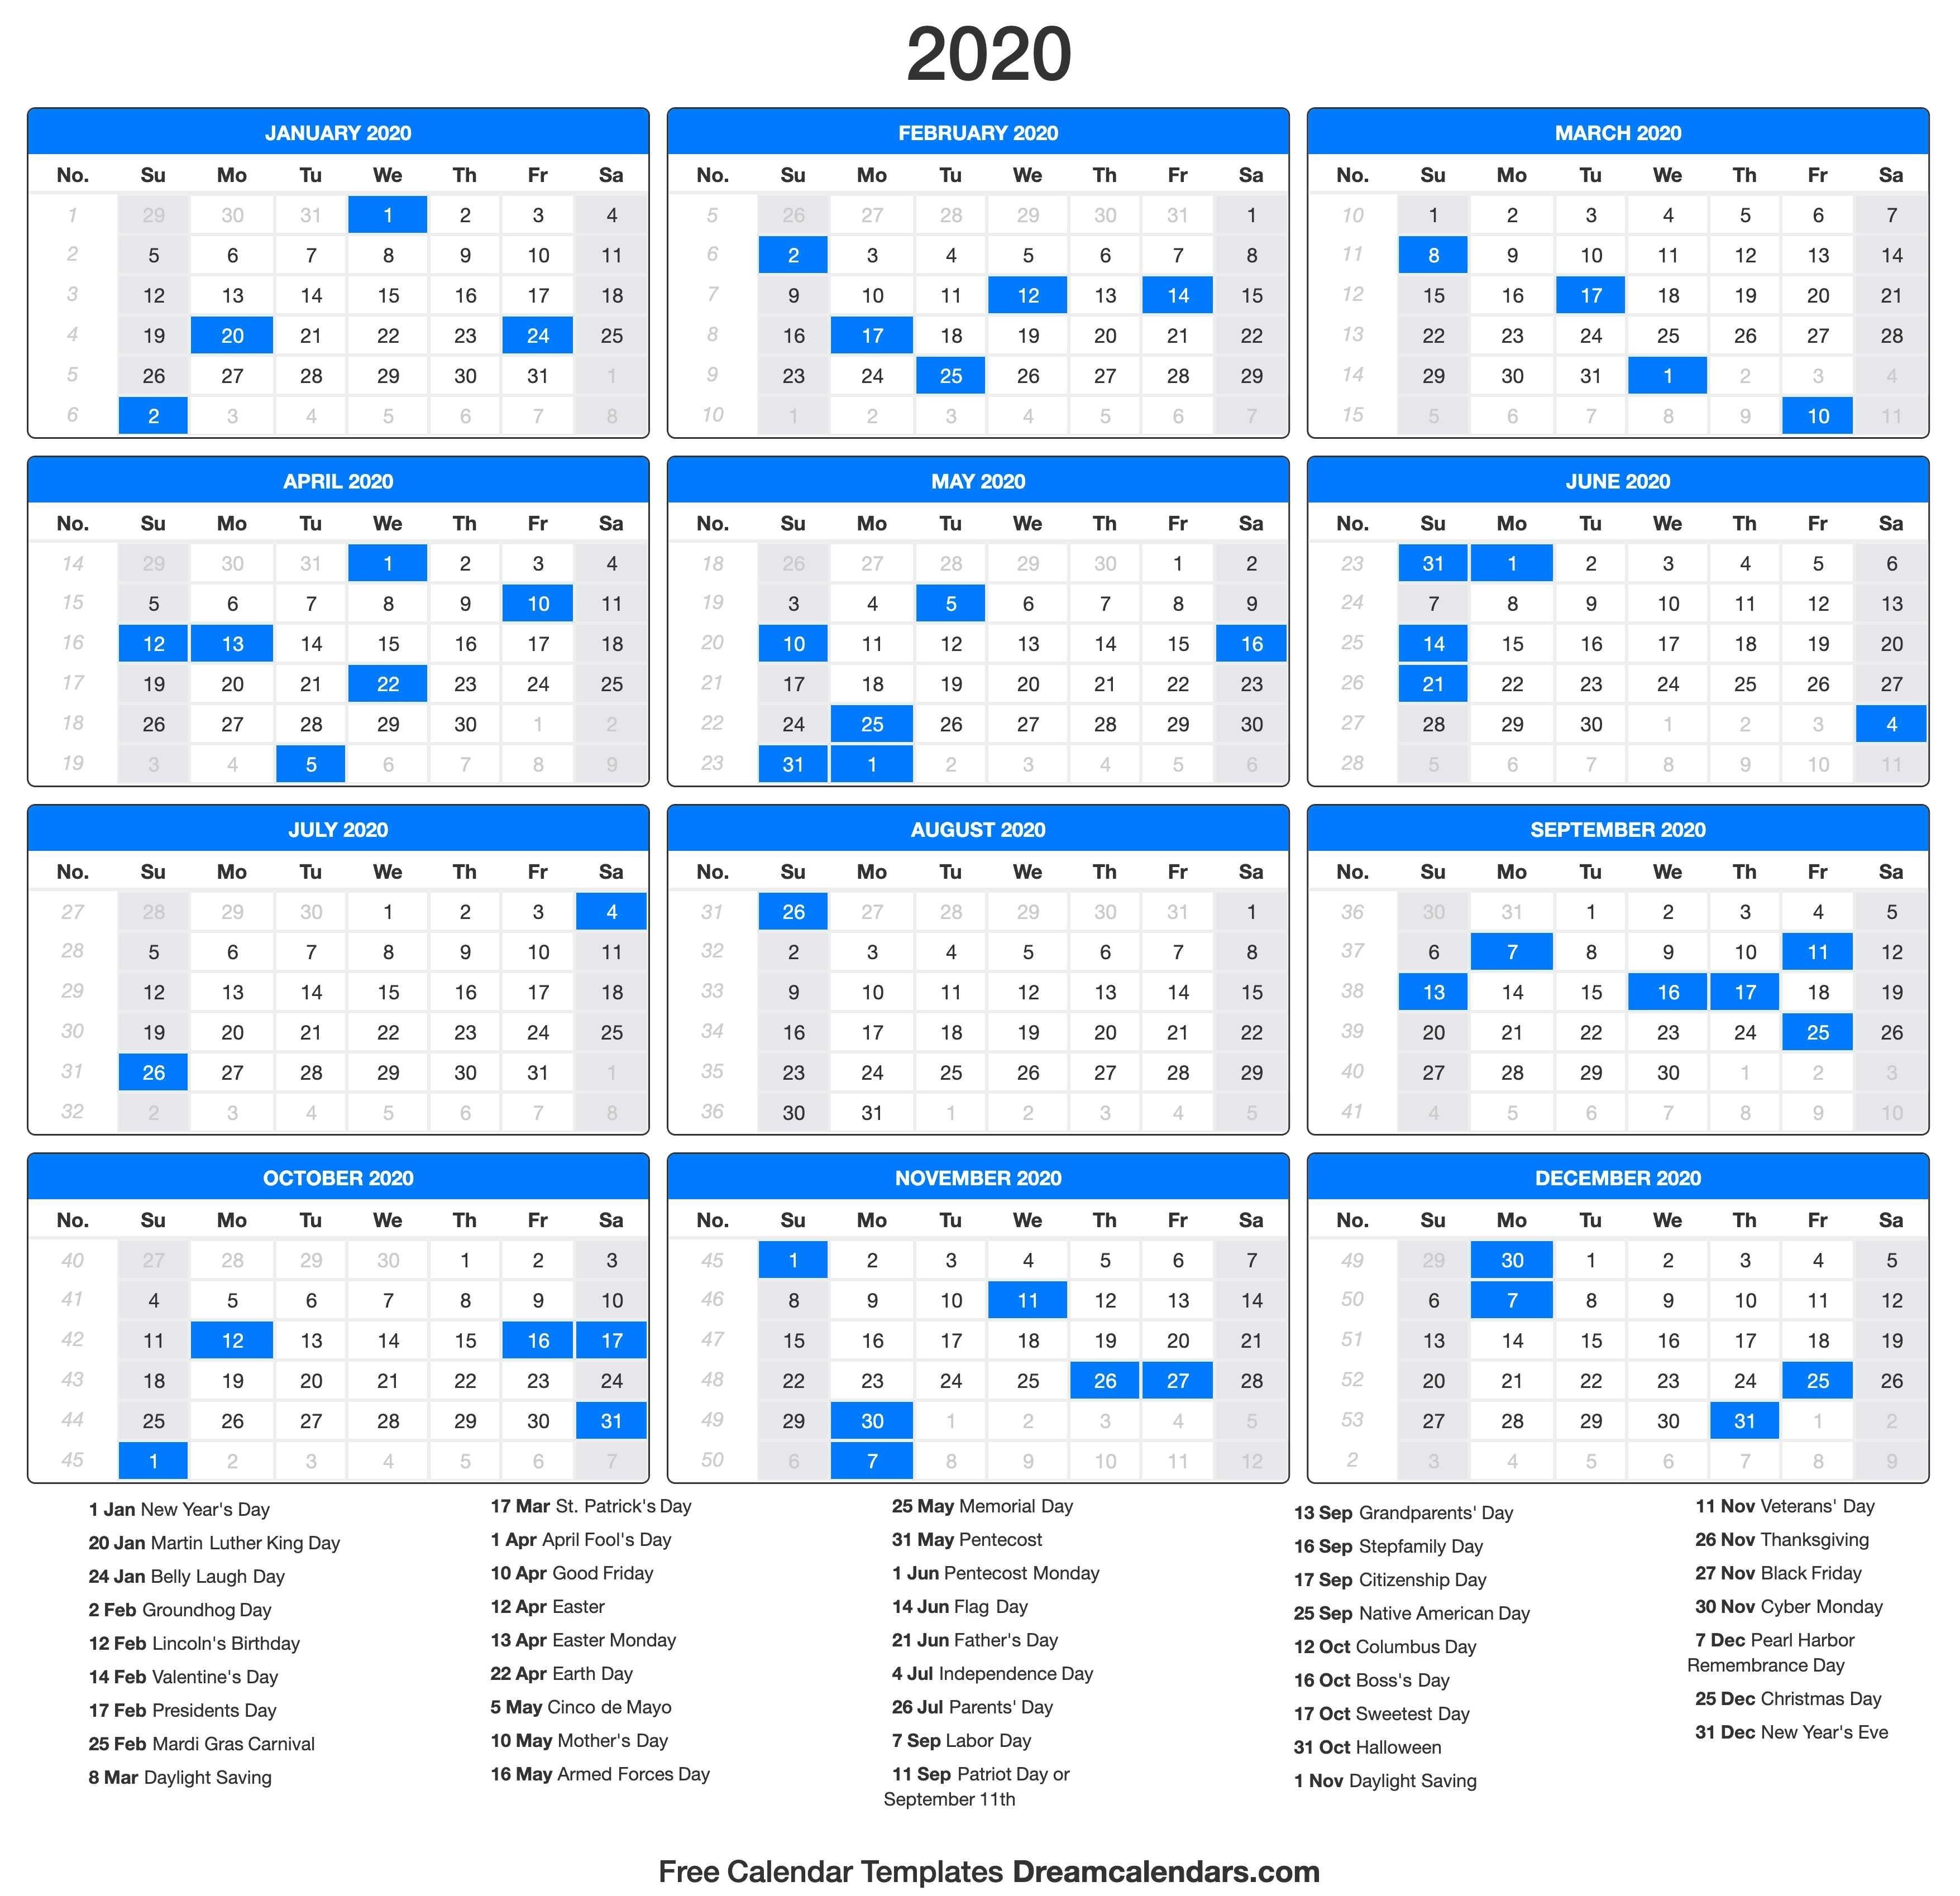 Printable 2020 Calendar - Dream Calendars-2020 Calendar With Holidays Usa Printable Year In Advance